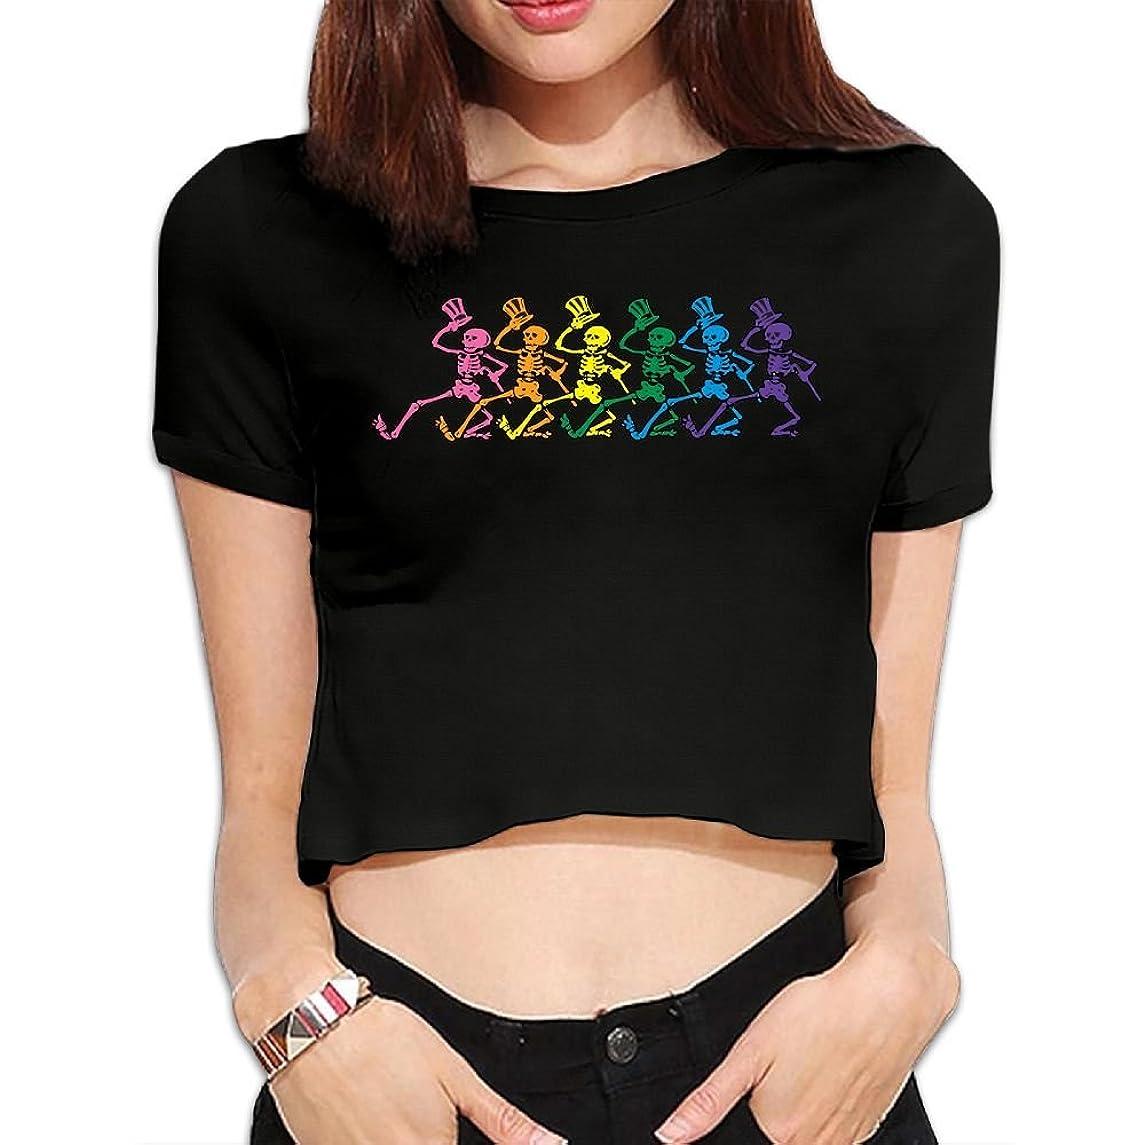 Gtaiquxin Grateful Dead Women's Midriff-Baring Short Sleeve T Shirt Black